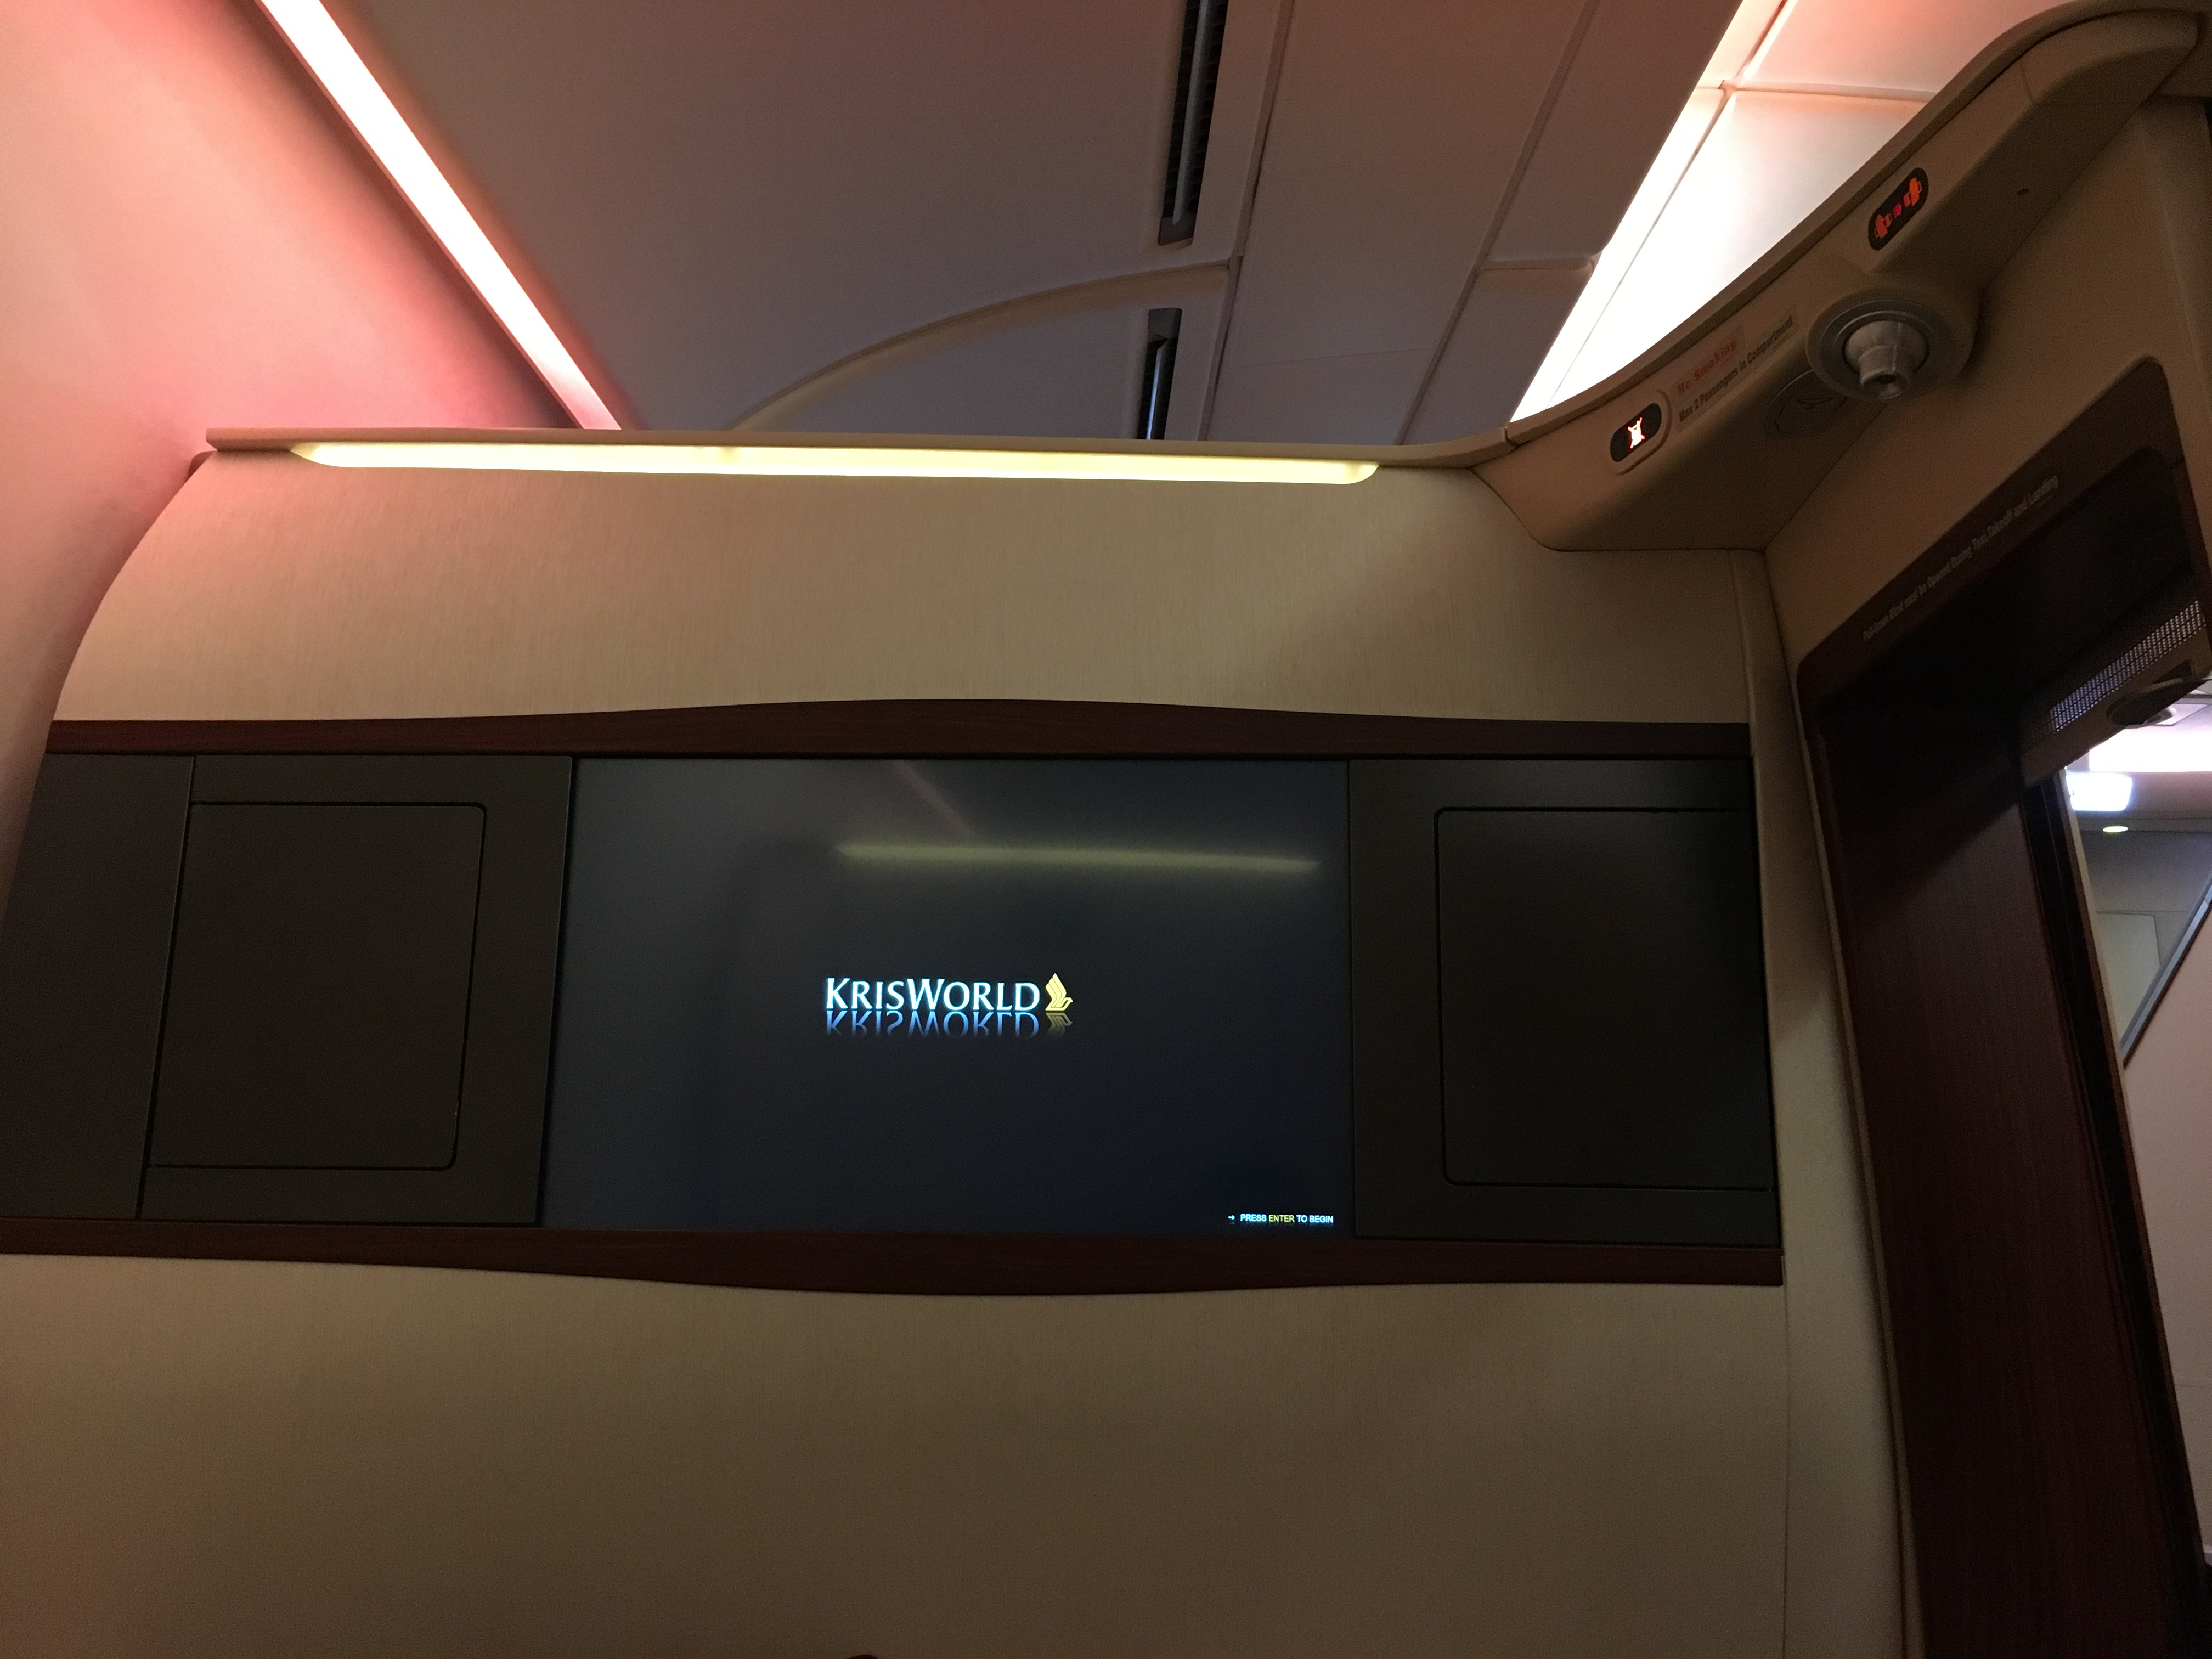 First Class Review : シンガポール航空(SQ) SQ638 シンガポール(SIN) – 成田(NRT) エアバス A380 スイートクラス